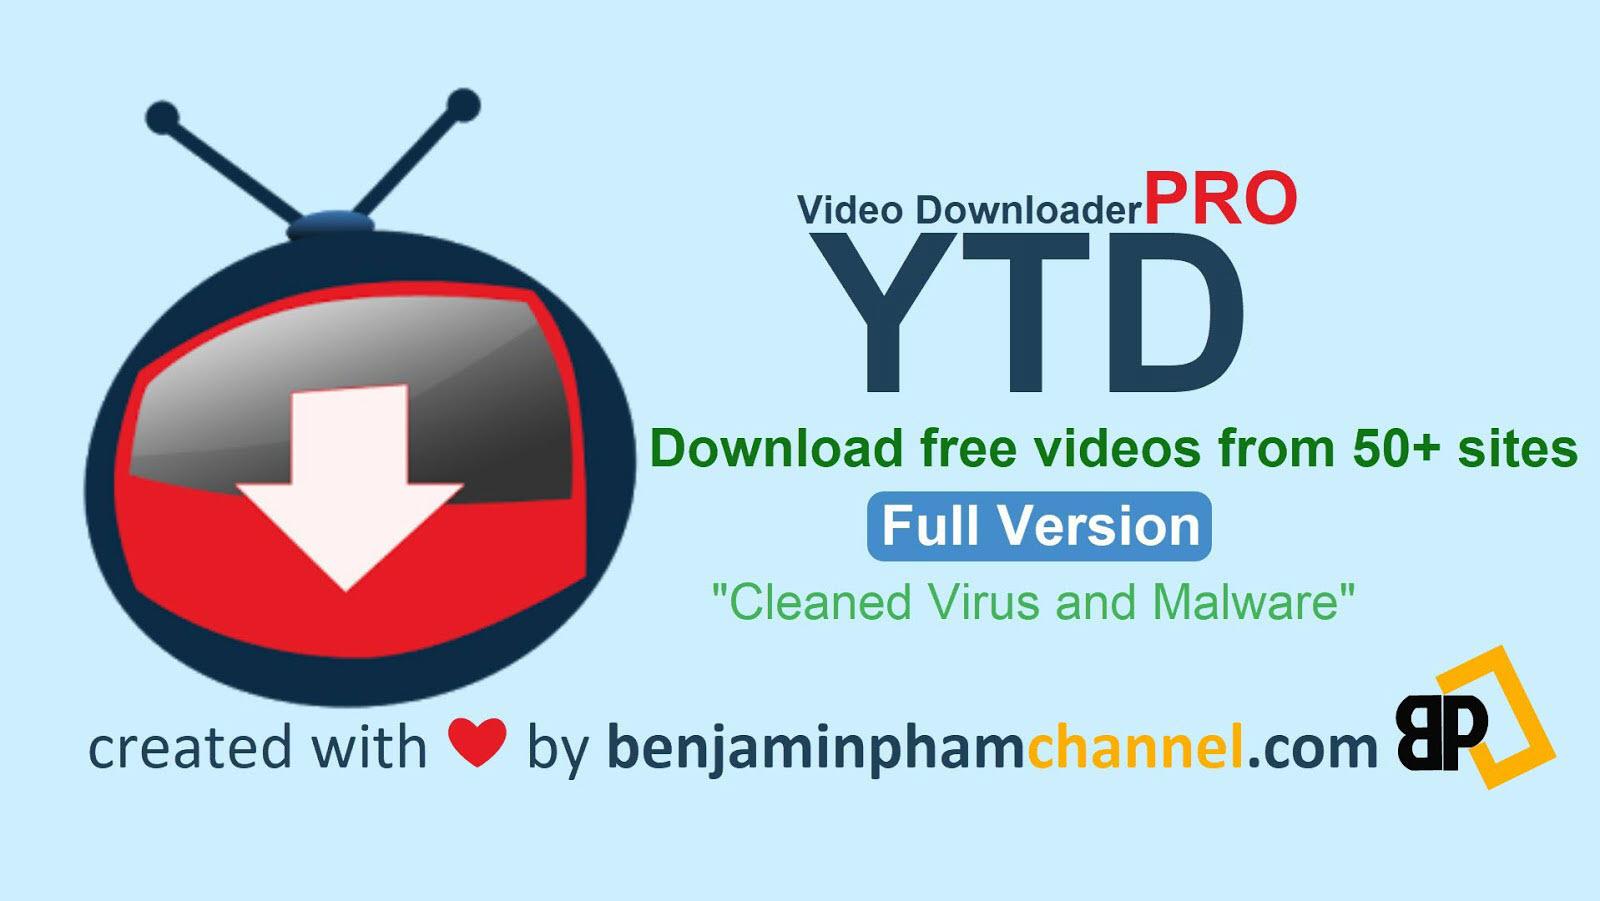 YTD Video Downloader Pro 5 9 10 4 - Benjamin Pham Channel